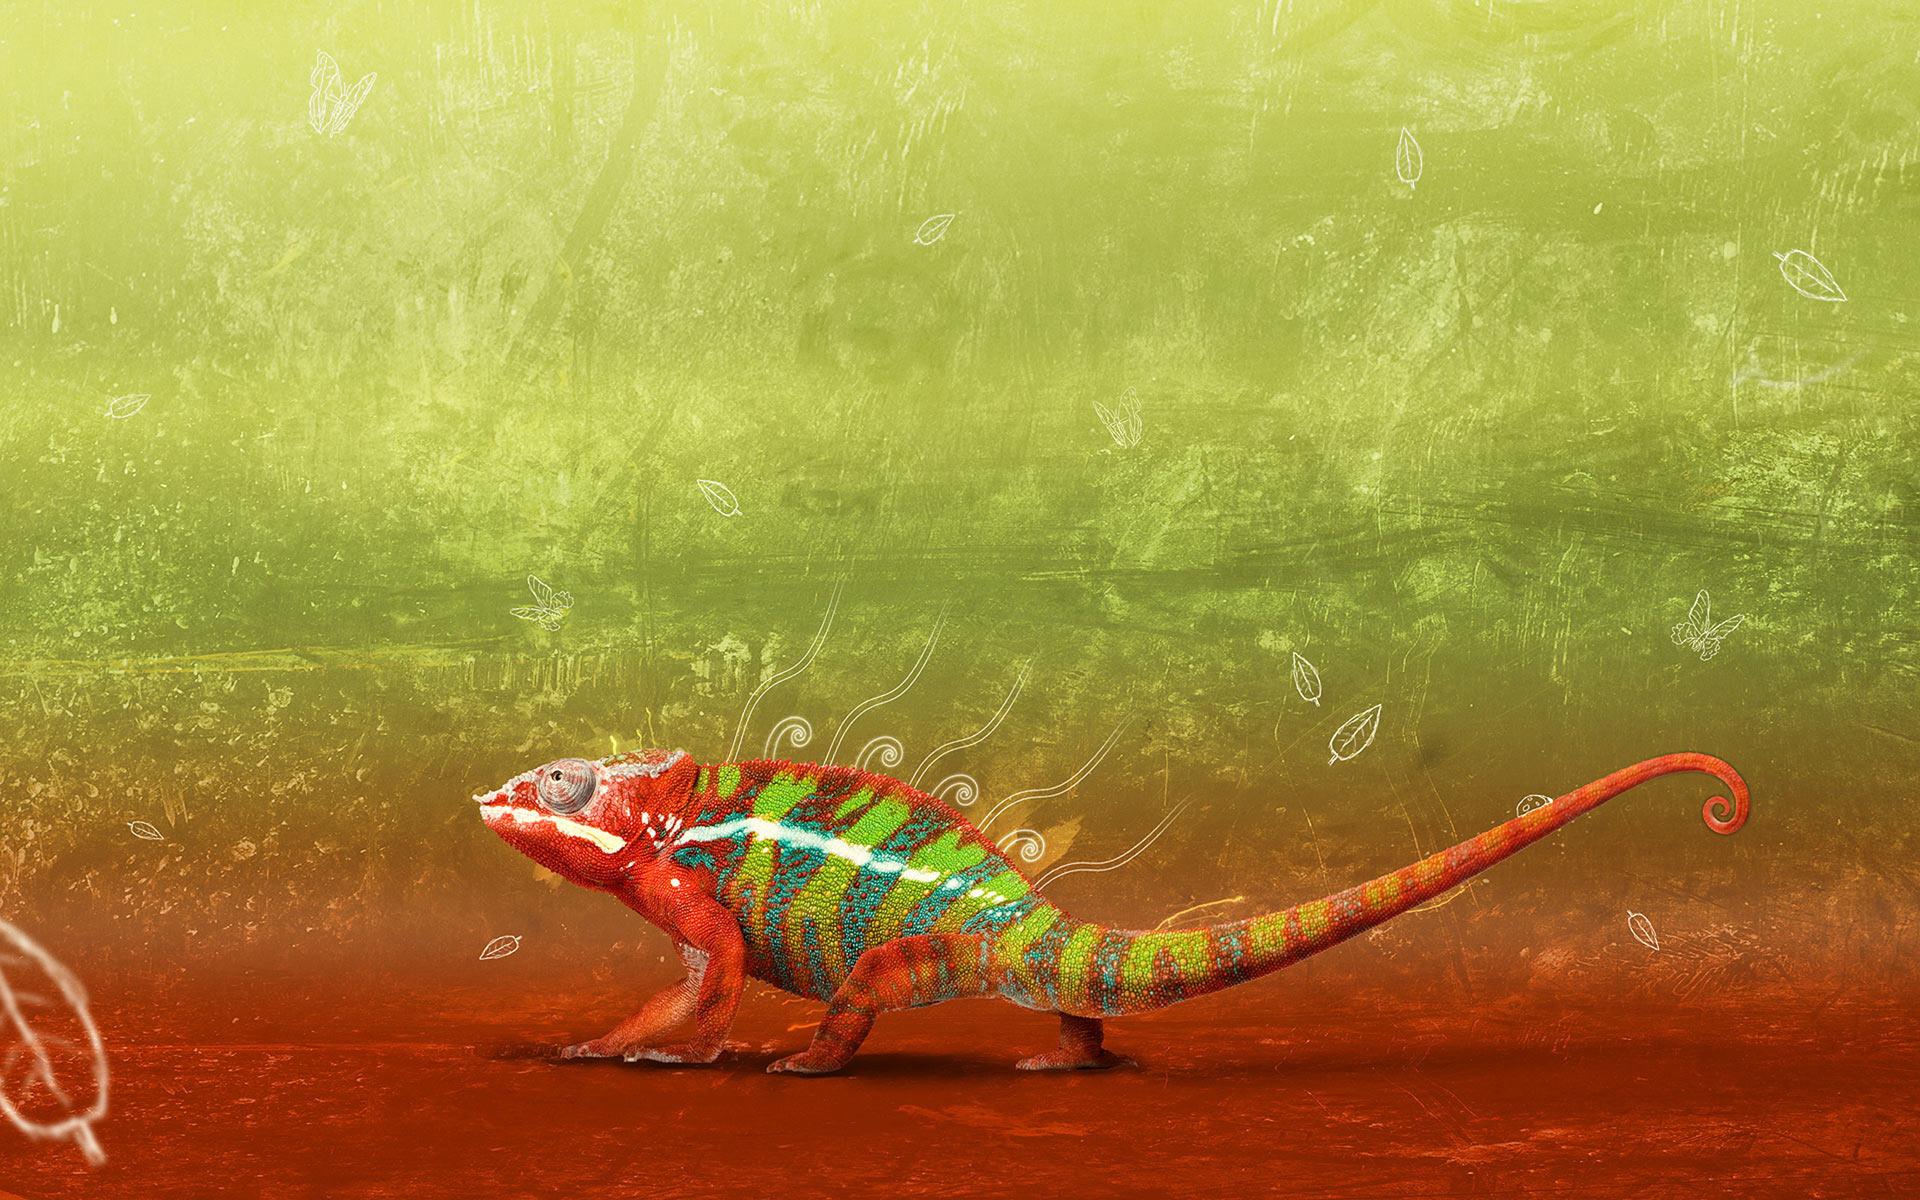 Cute Animal Wallpapers Free Download Chameleon Wallpaper Hd Desktop Wallpapers 4k Hd